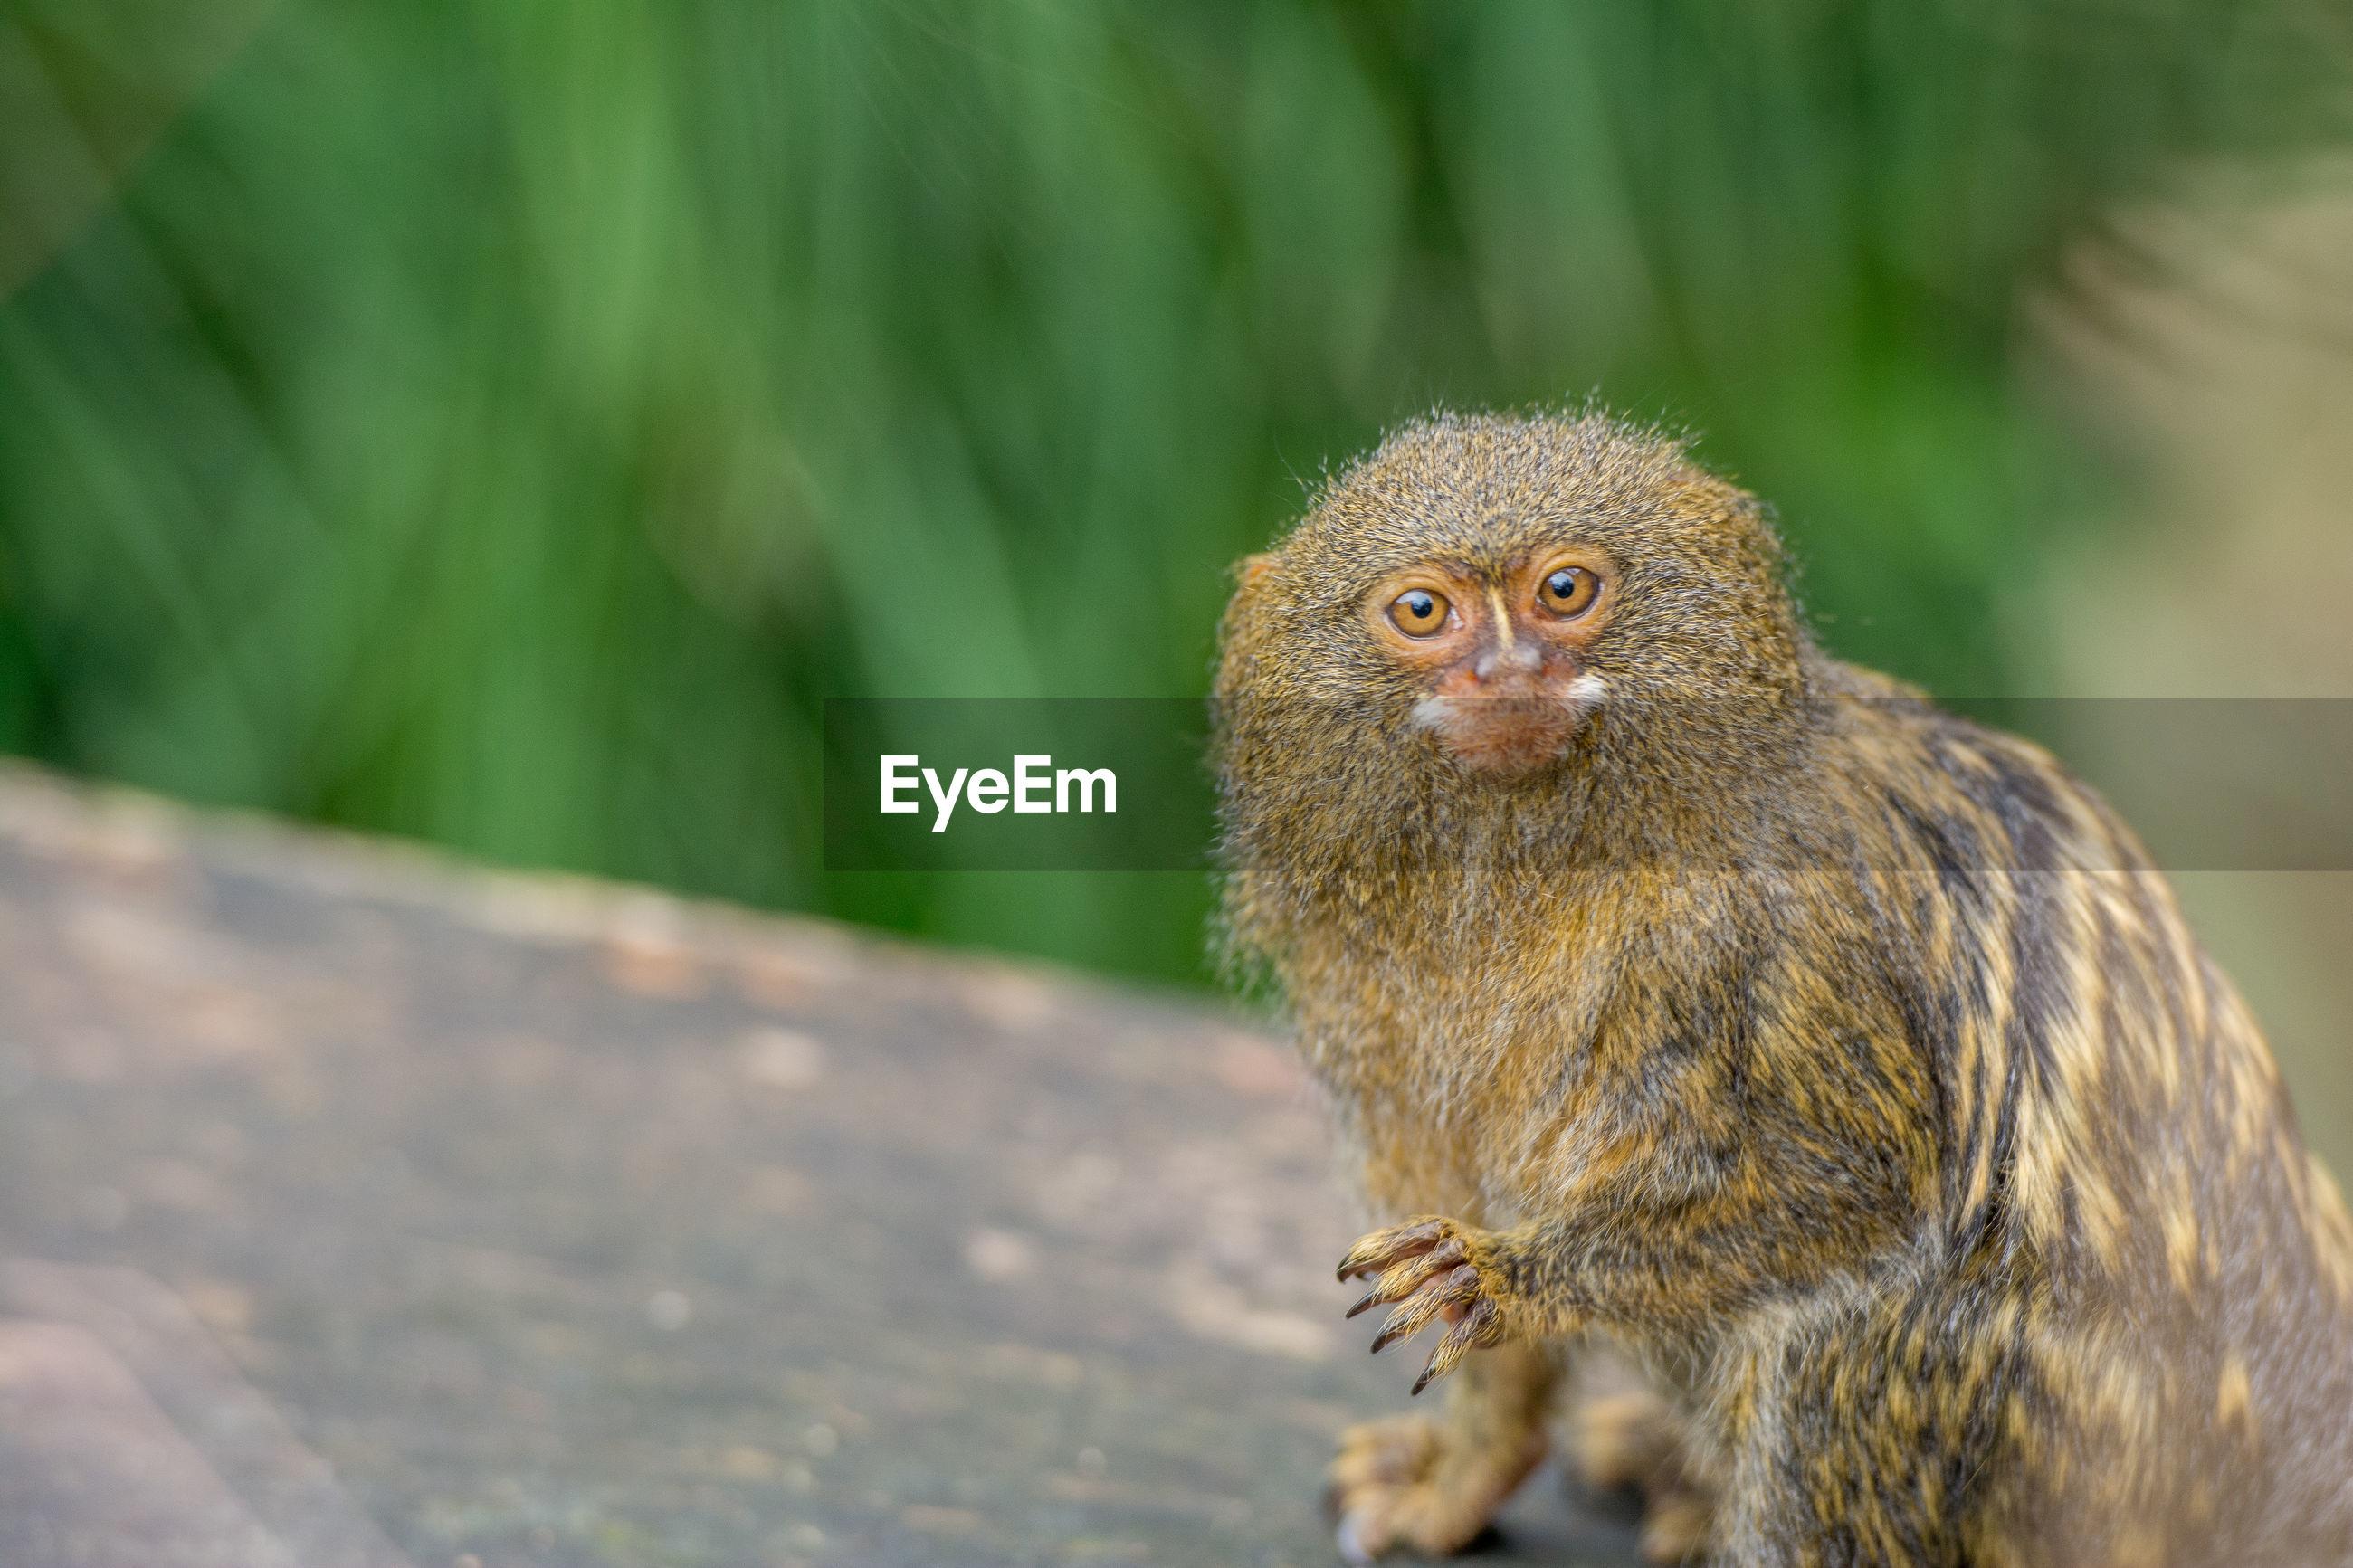 Close-up of a pygmy marmoset monkey